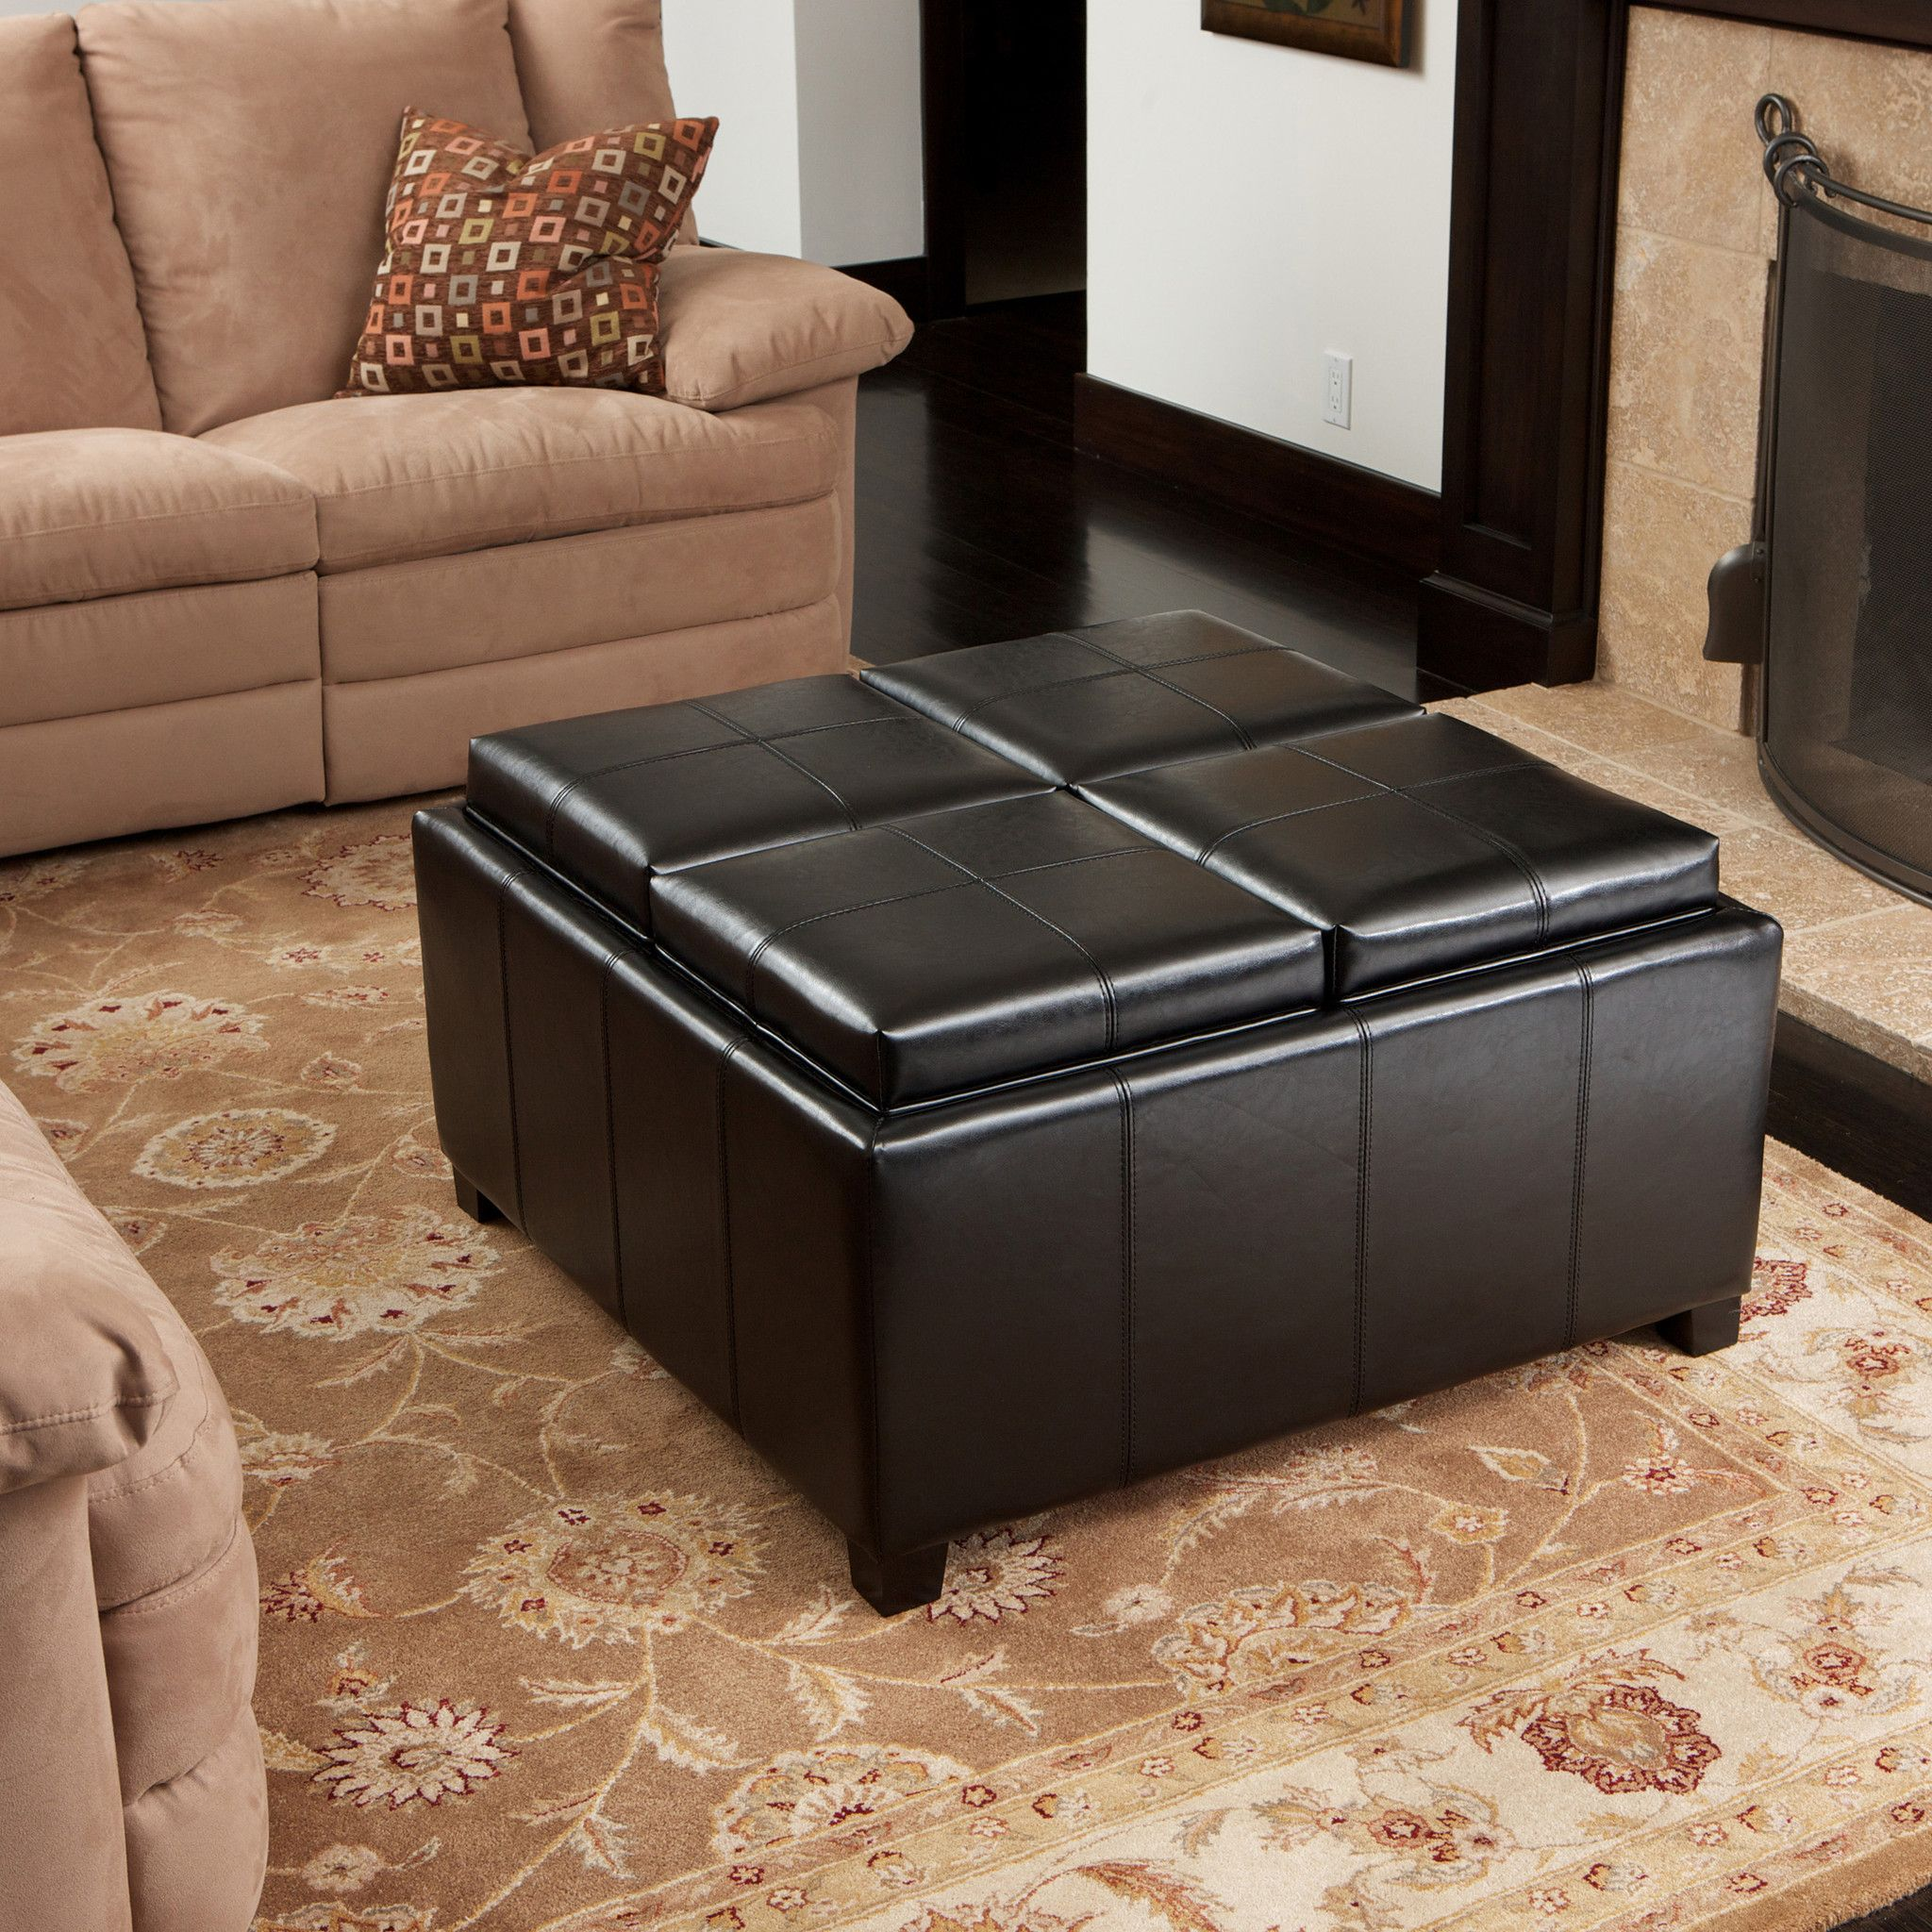 Harley leather black 4tray top storage ottoman storage